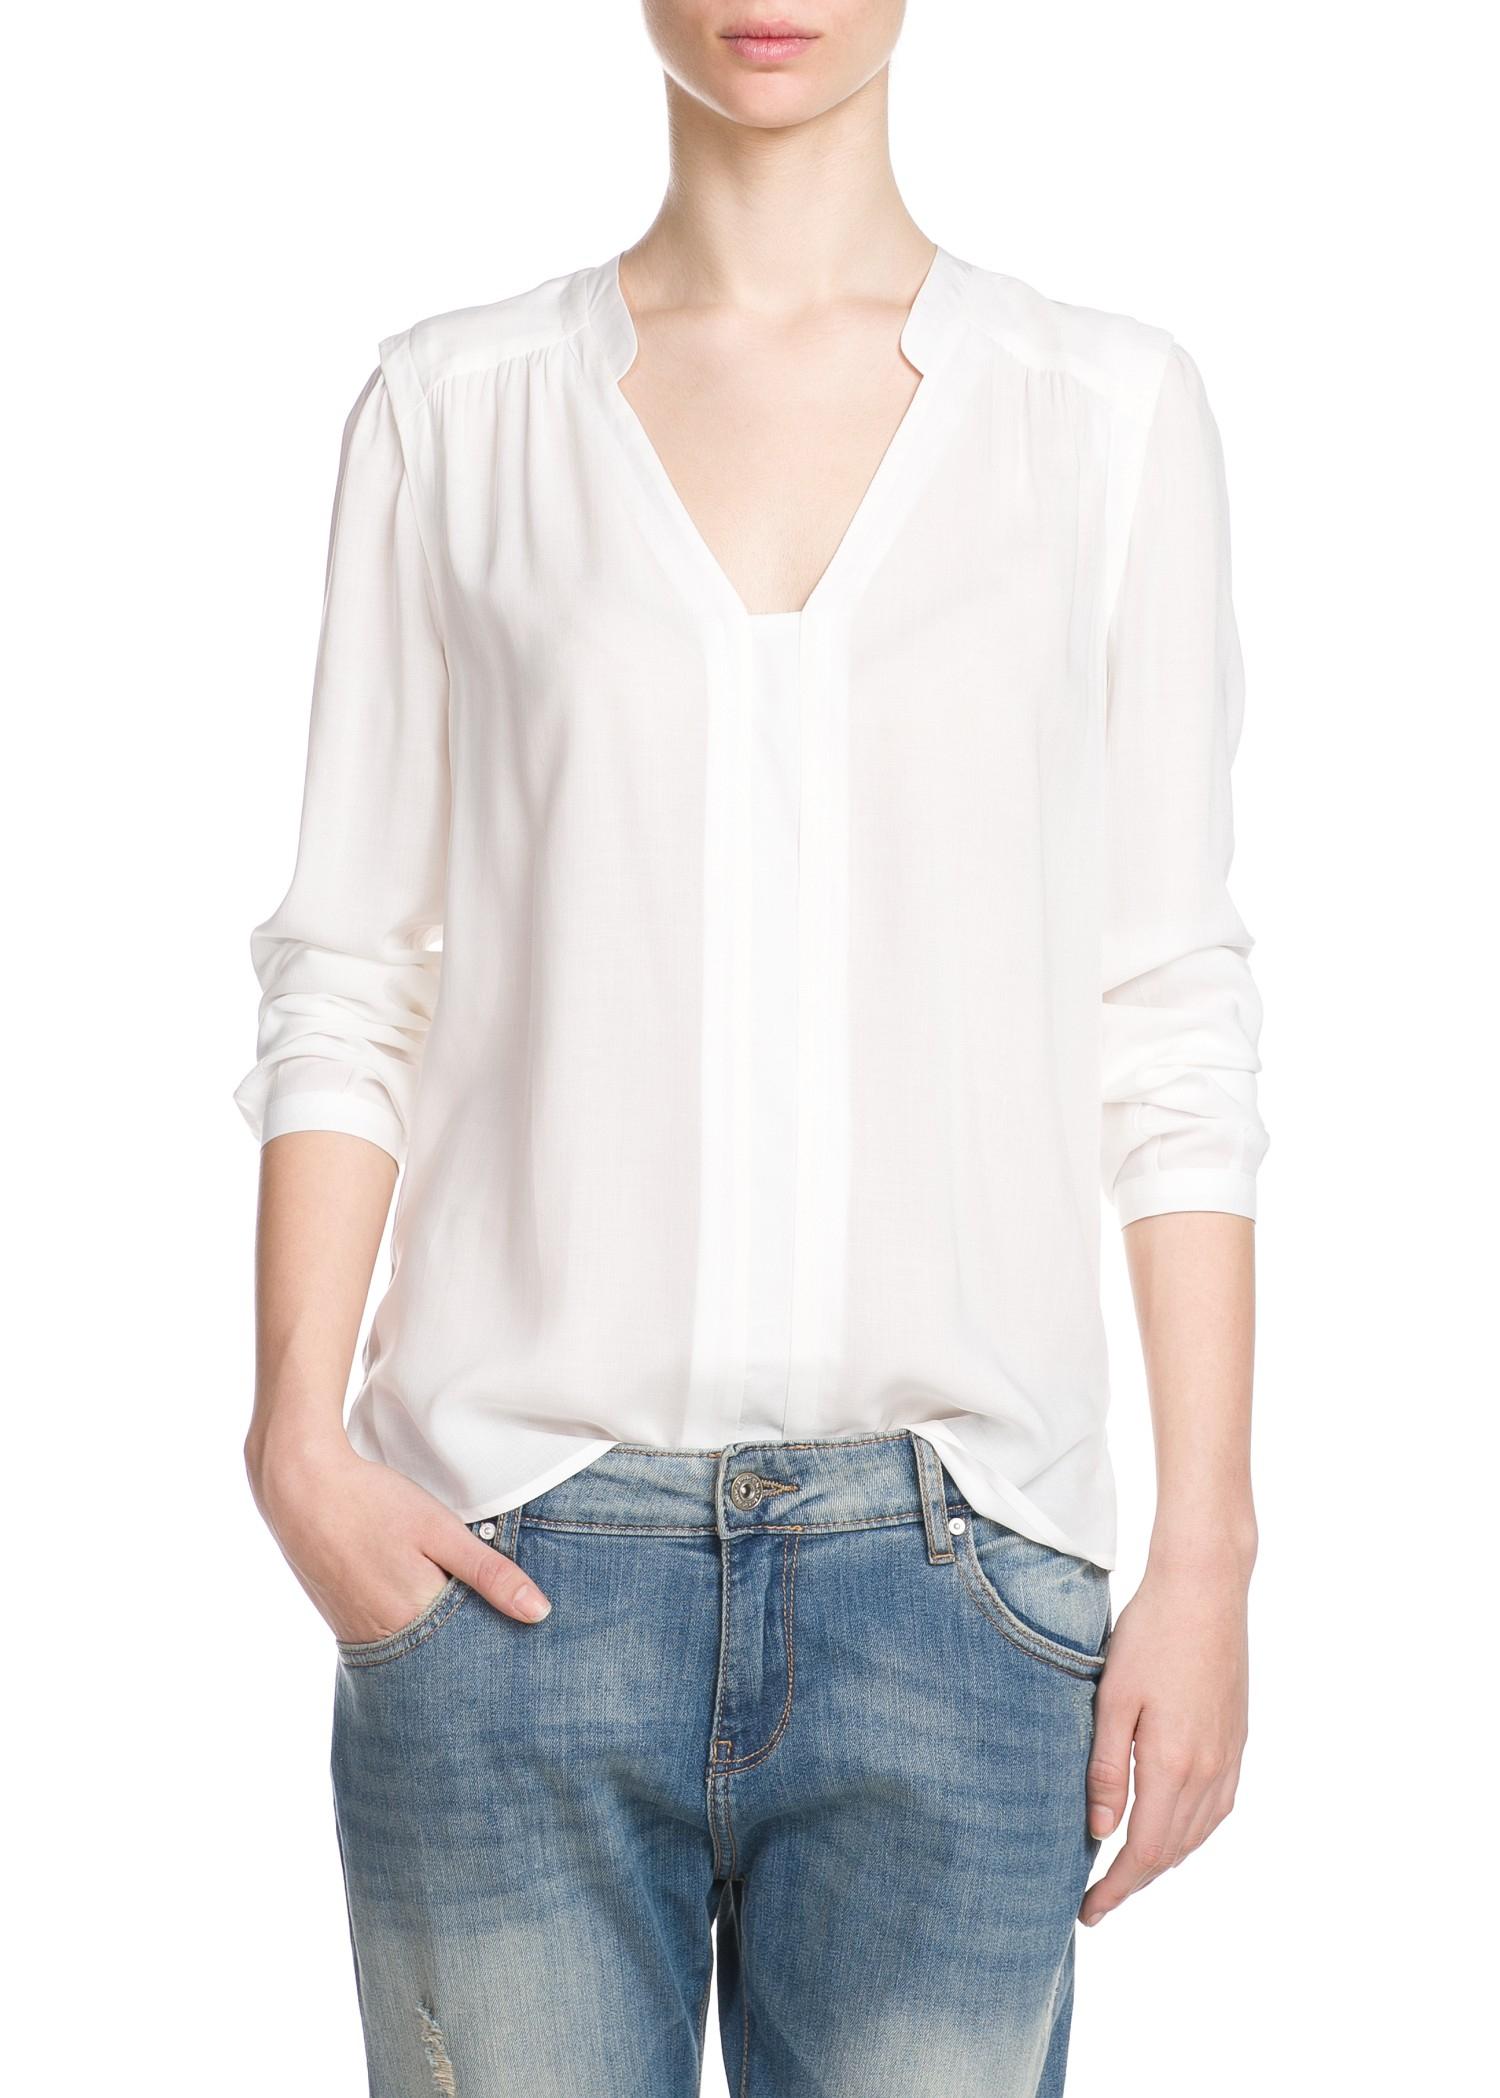 Mango Flowy Shirt in White | Lyst